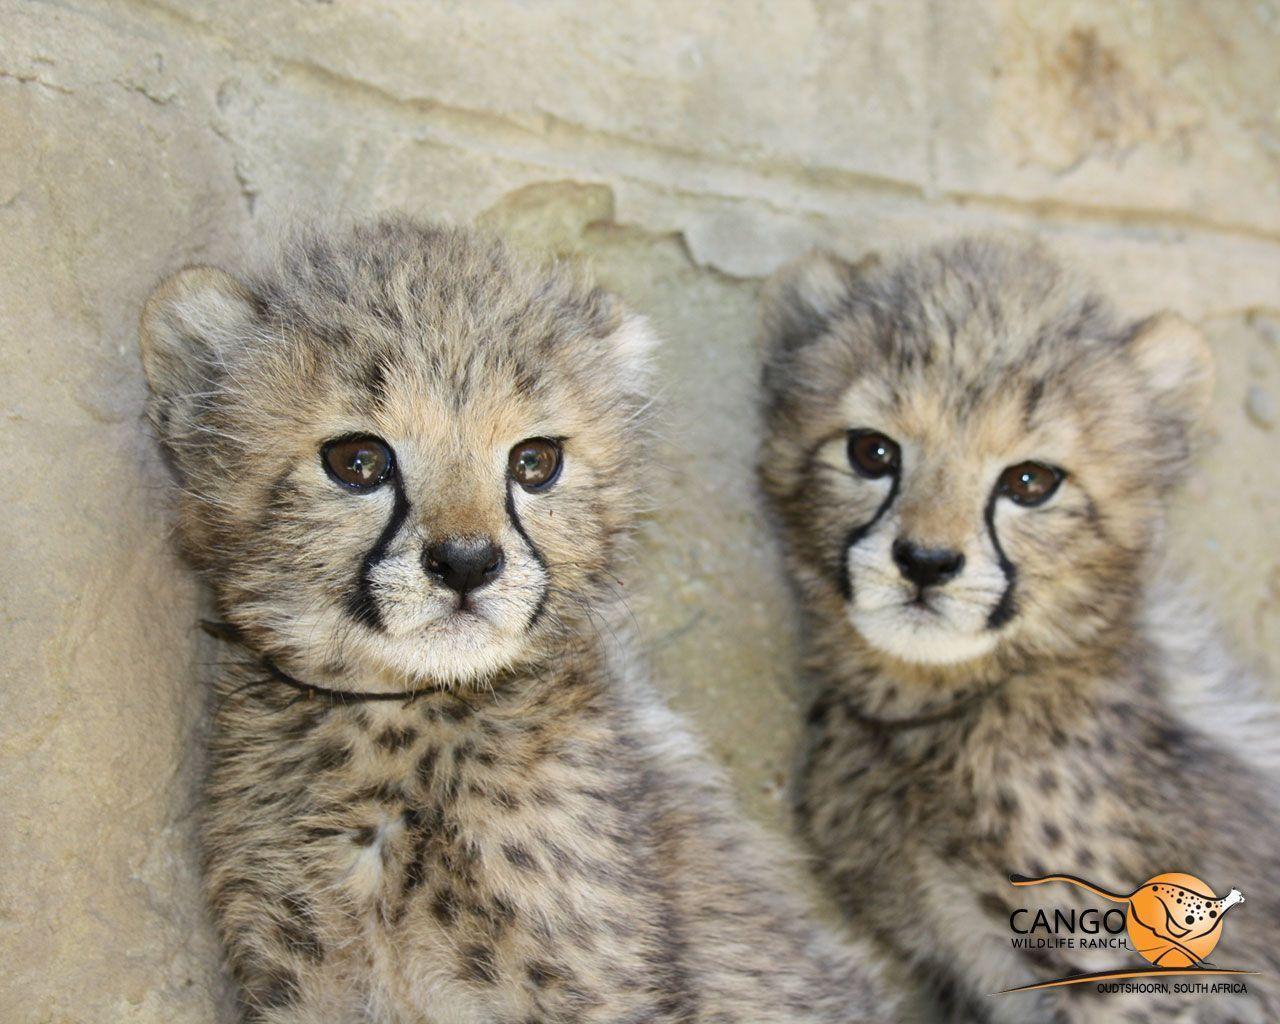 Cute Cheetah Wallpapers - Wallpaper Cave | 1280 x 1024 jpeg 172kB